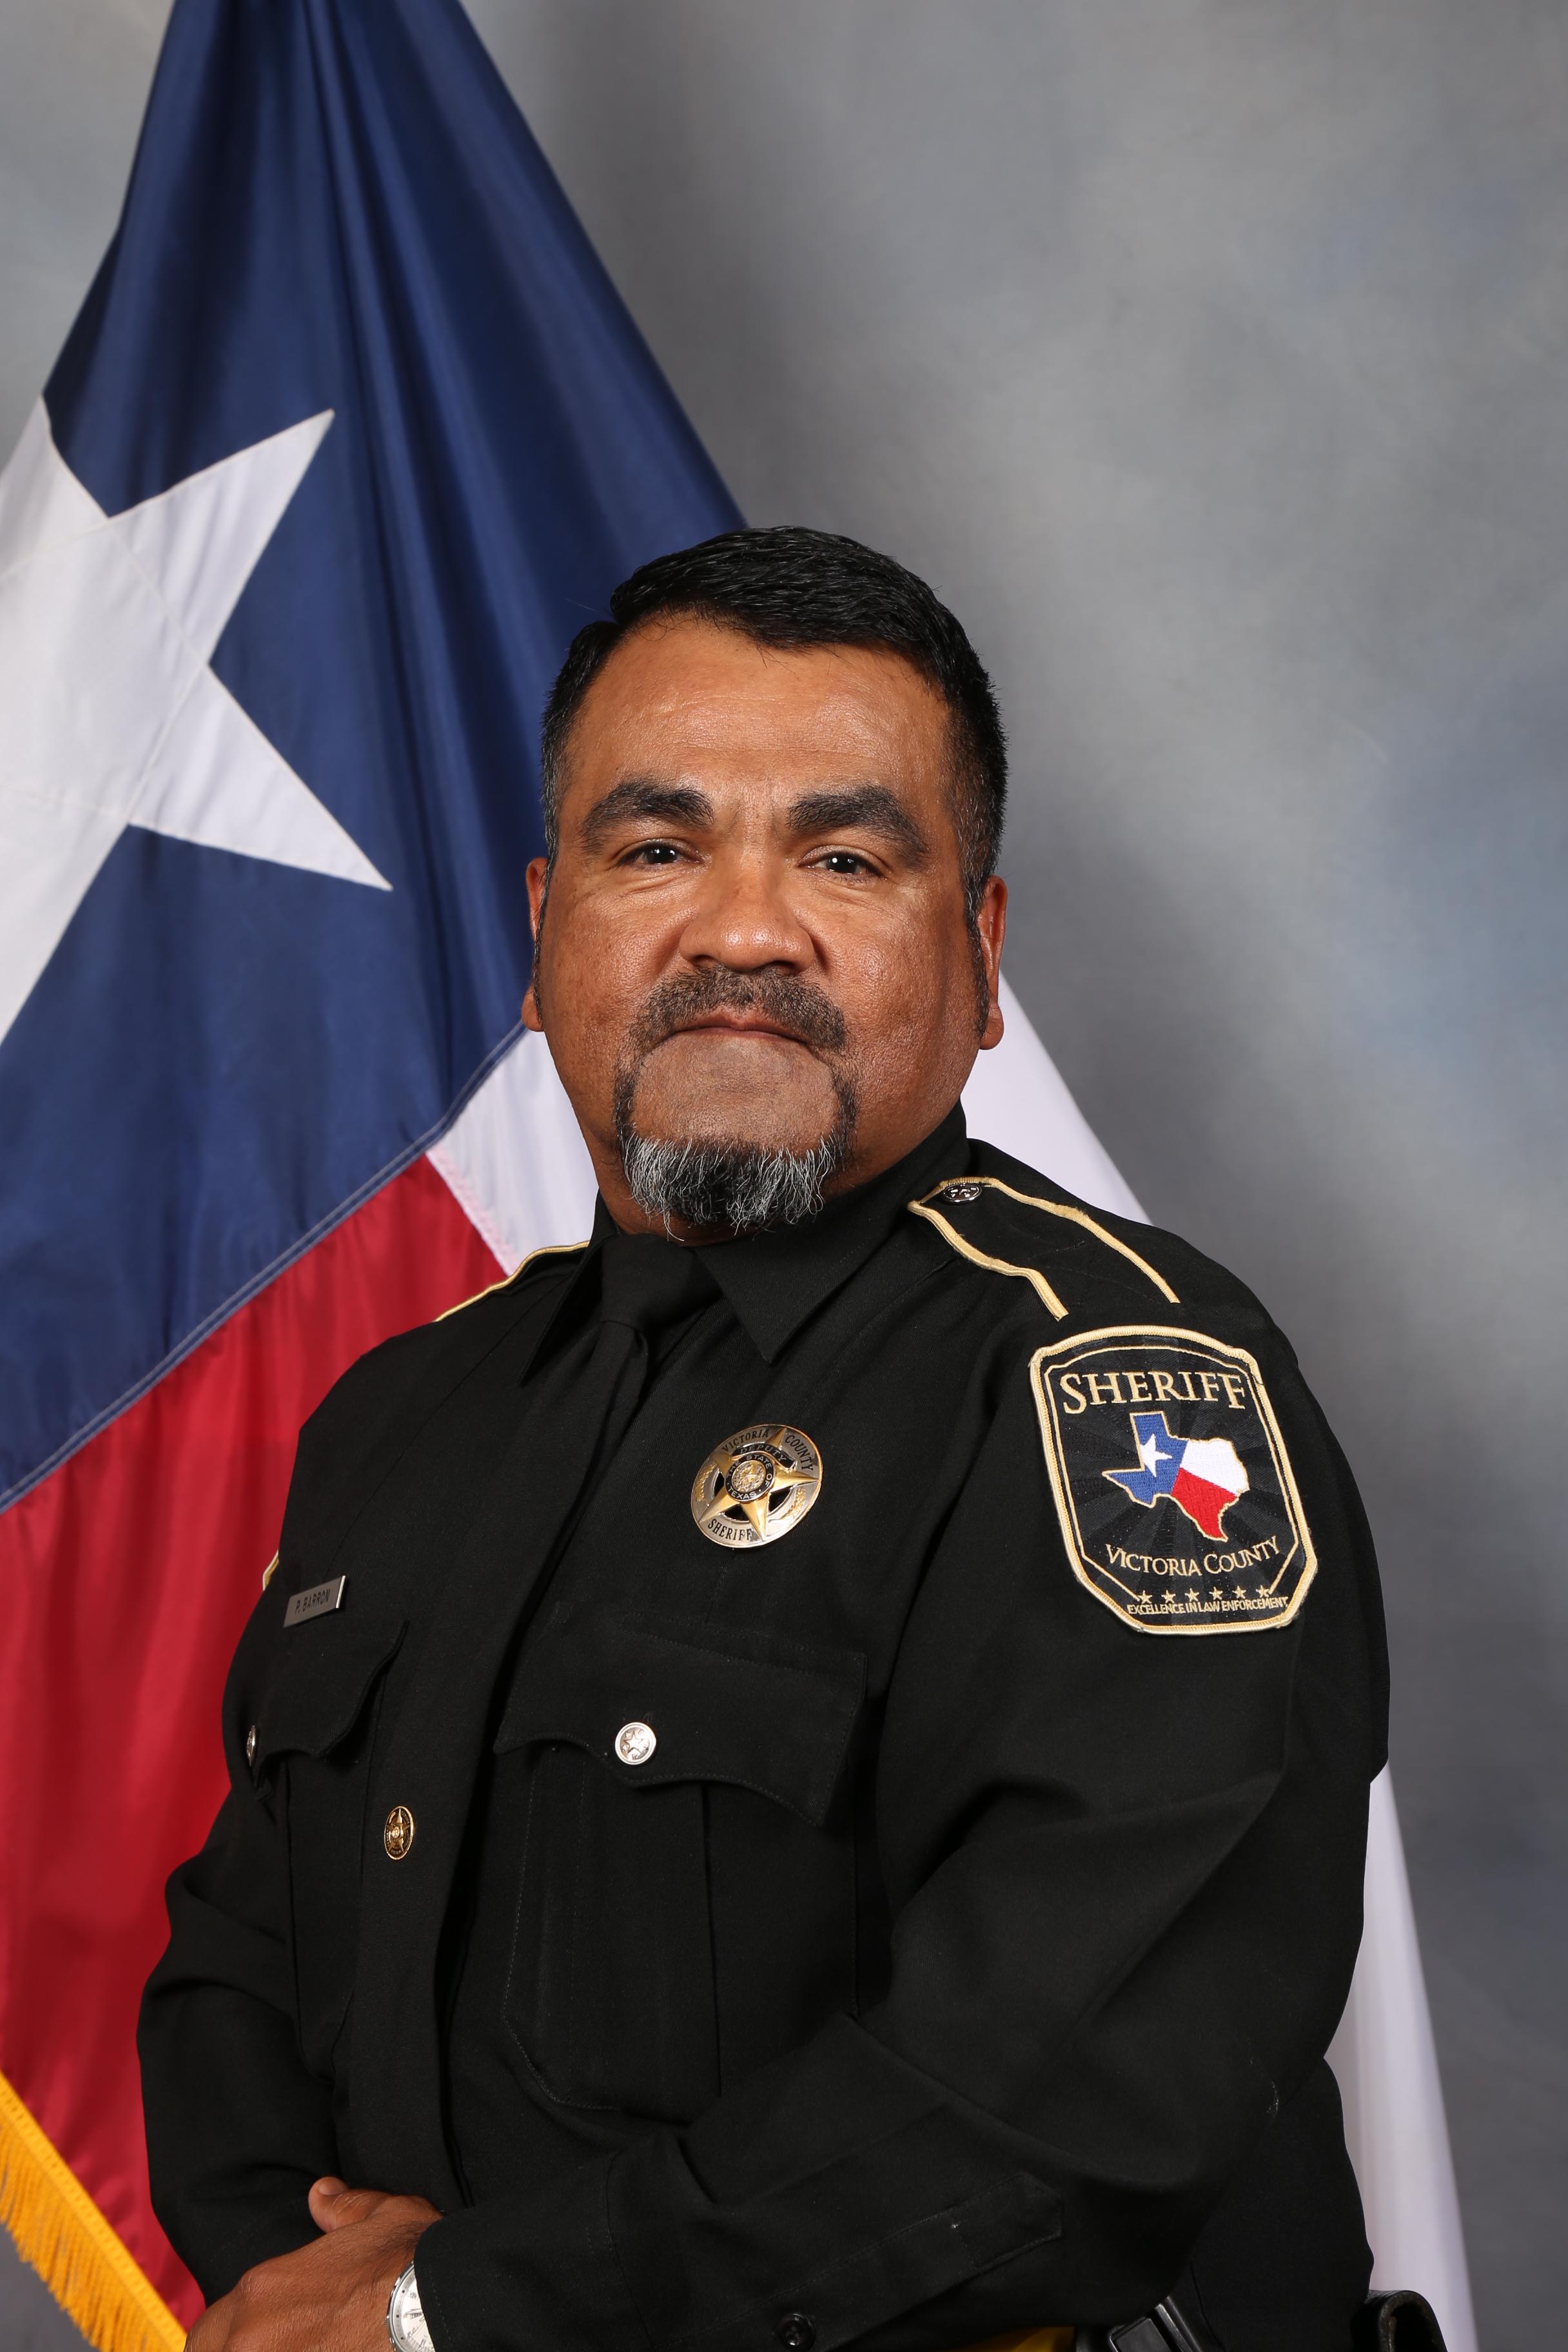 Senior Deputy Phillip David Barron, Jr.   Victoria County Sheriff's Office, Texas